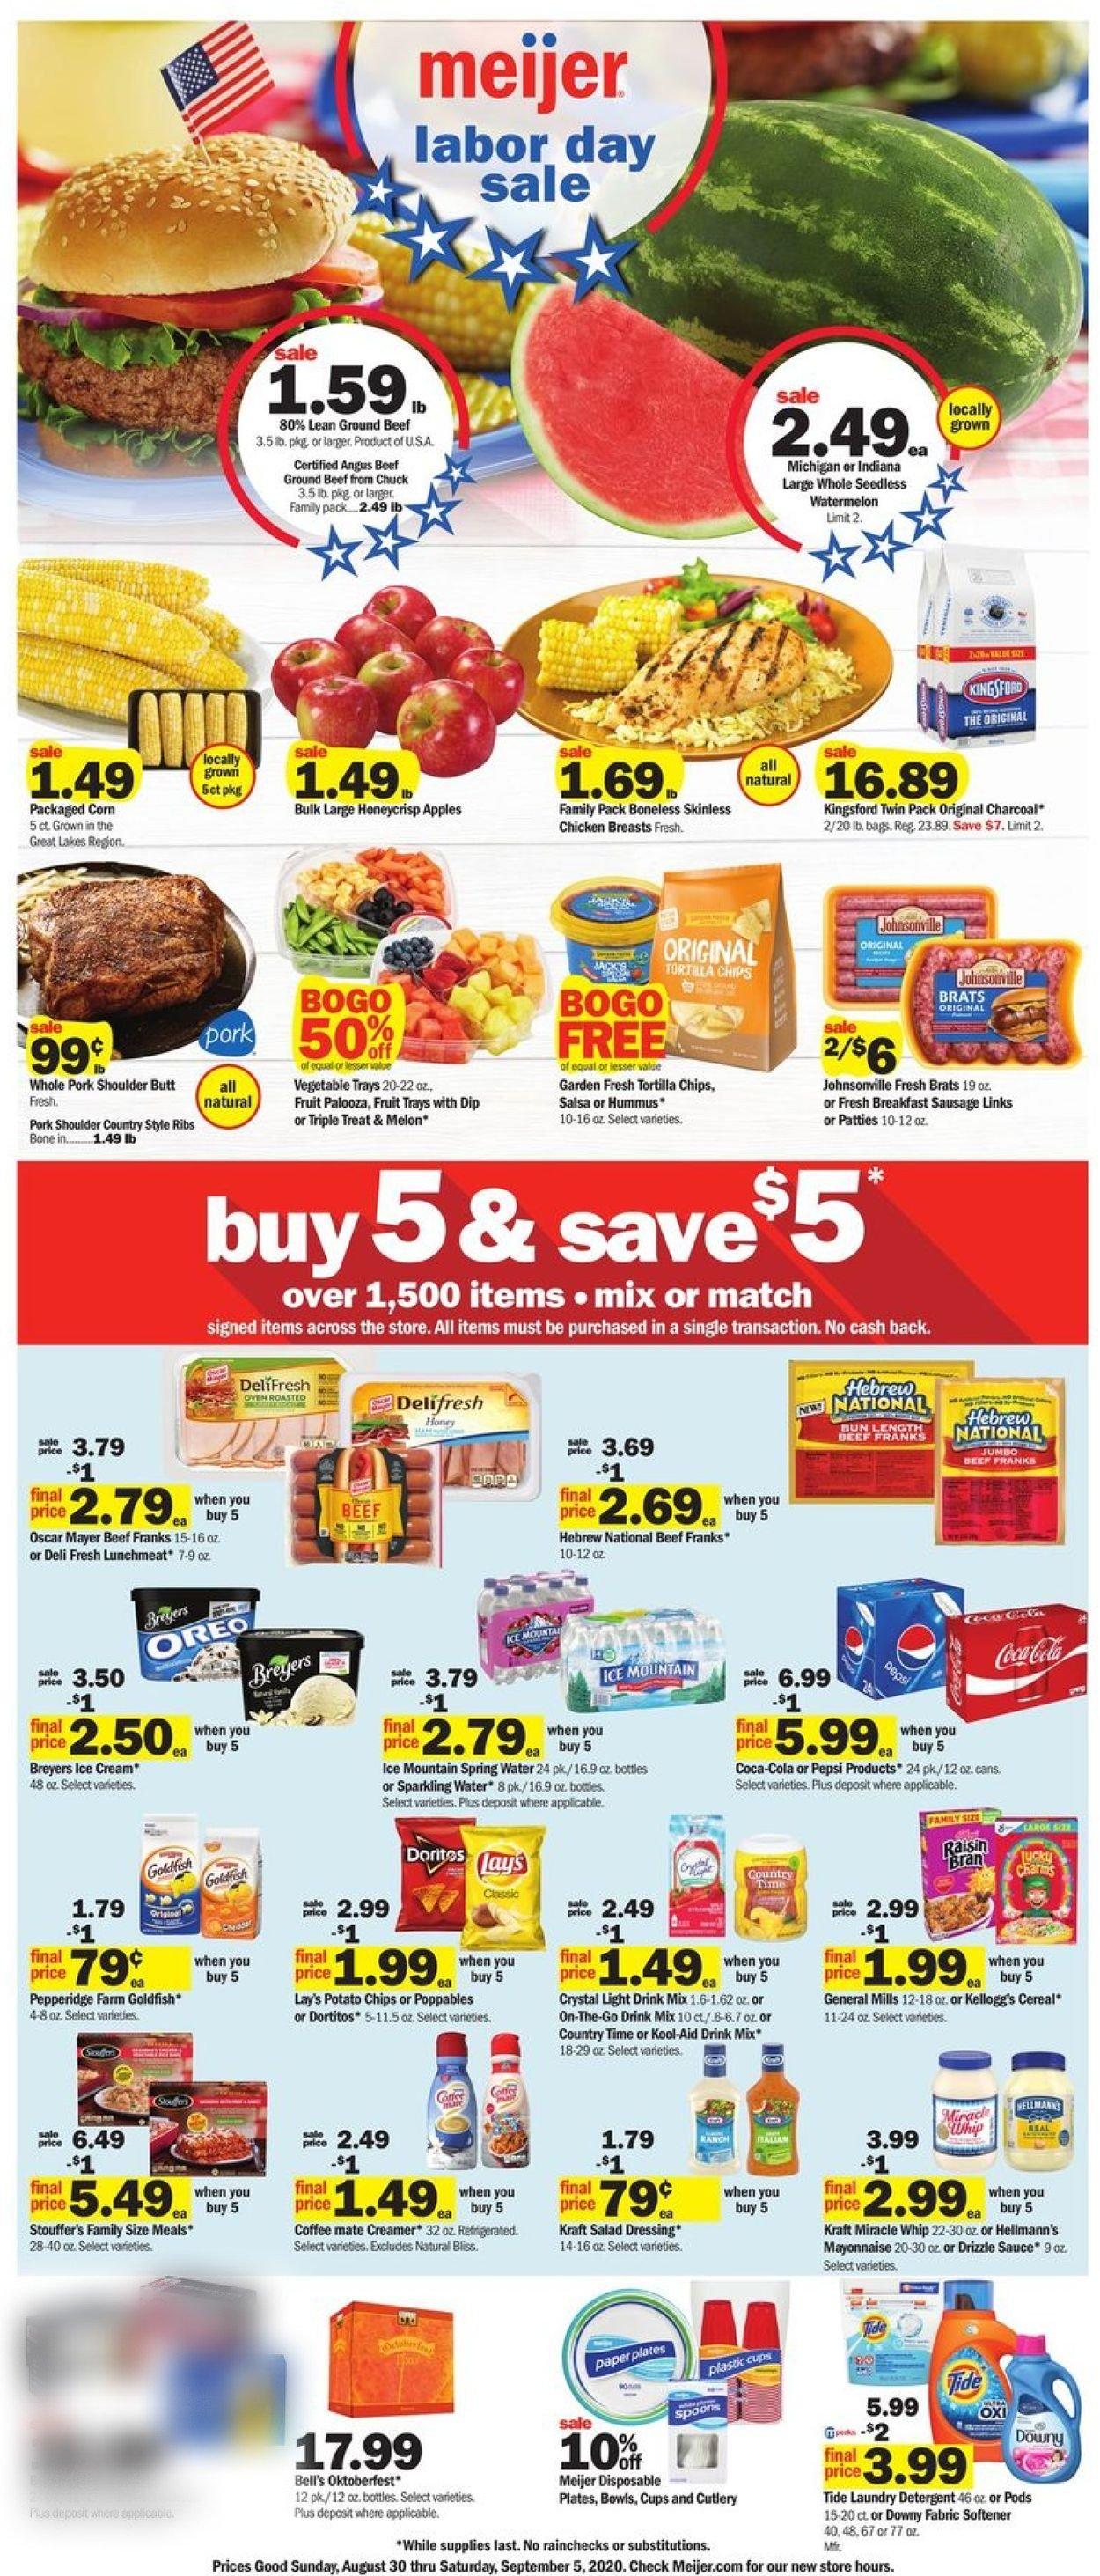 Meijer Weekly Ad Circular - valid 08/30-09/05/2020